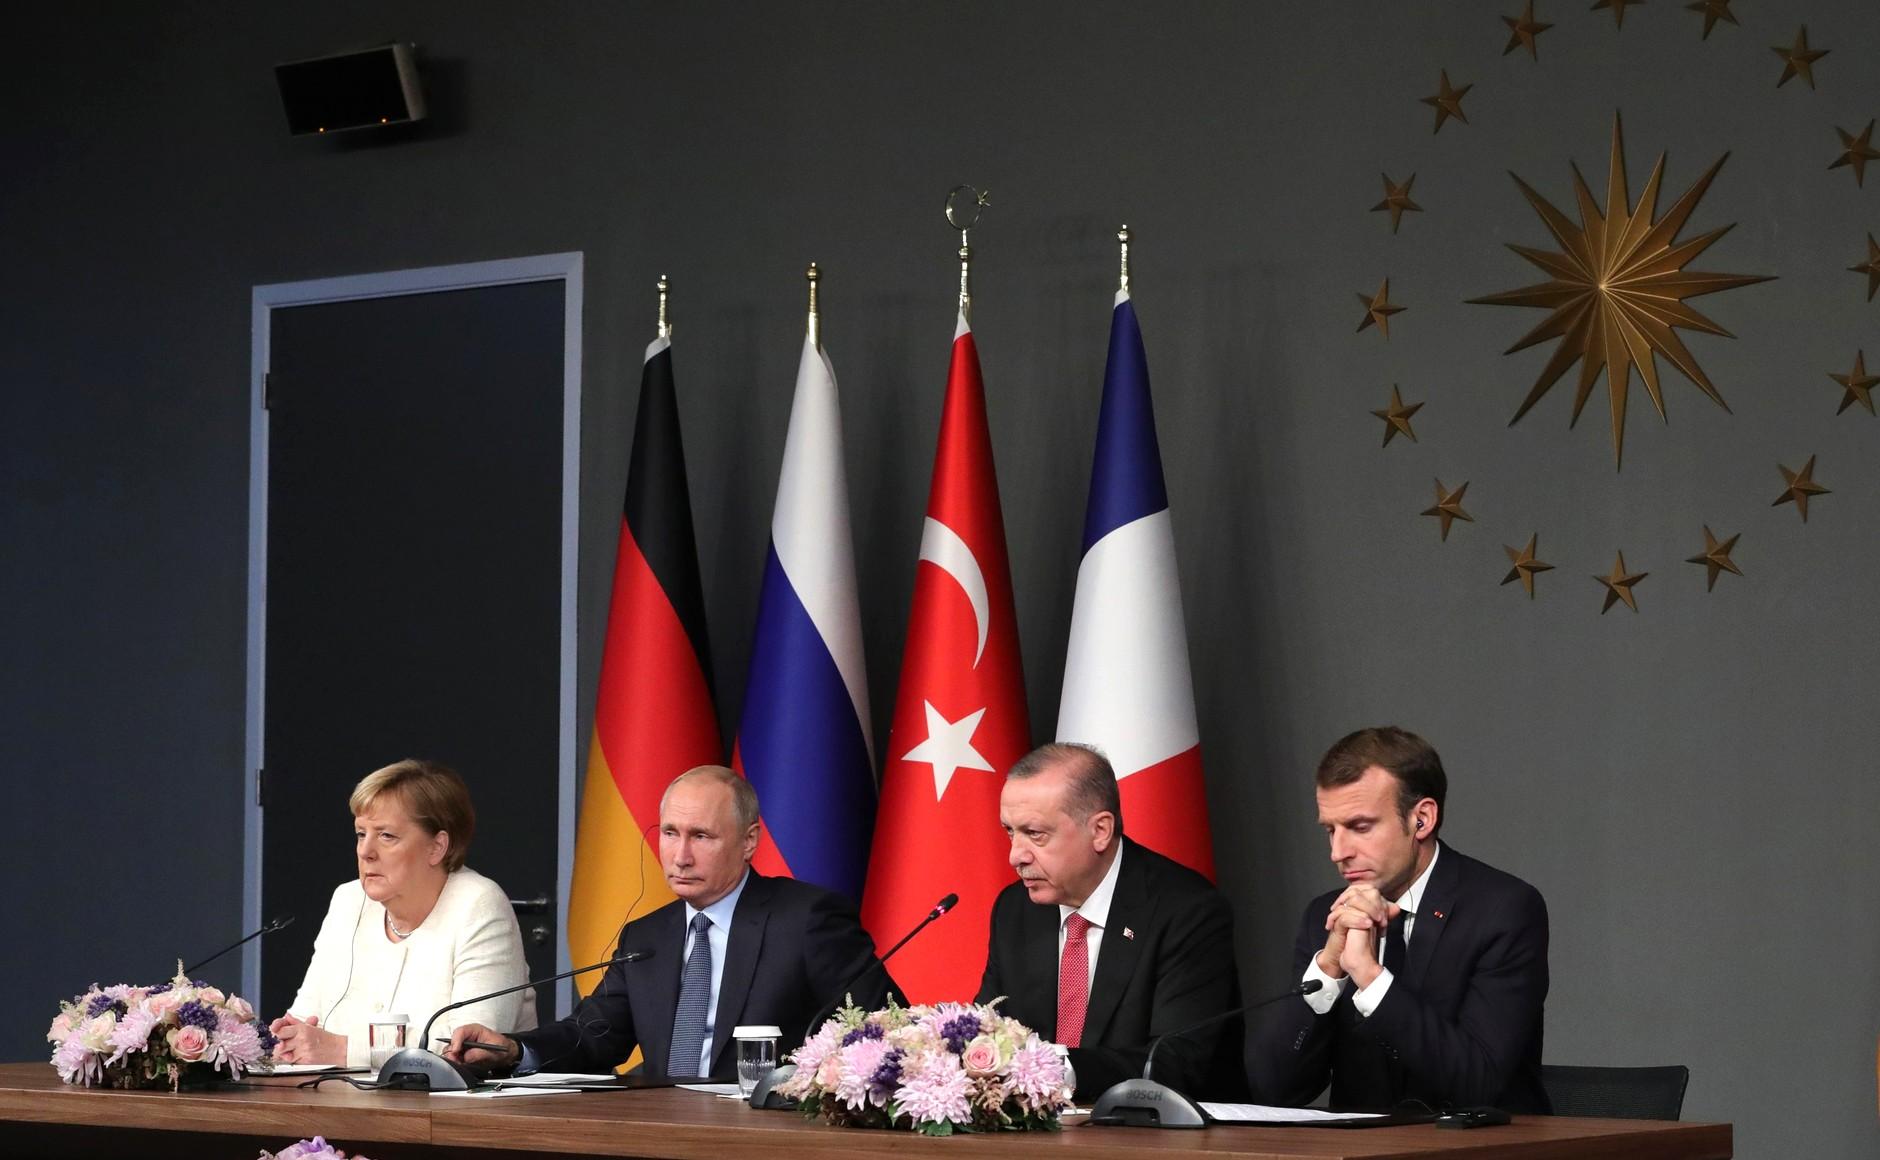 File:Merkel, Putin, Erdoğan and Macron during the joint press release.jpg - Wikimedia Commons